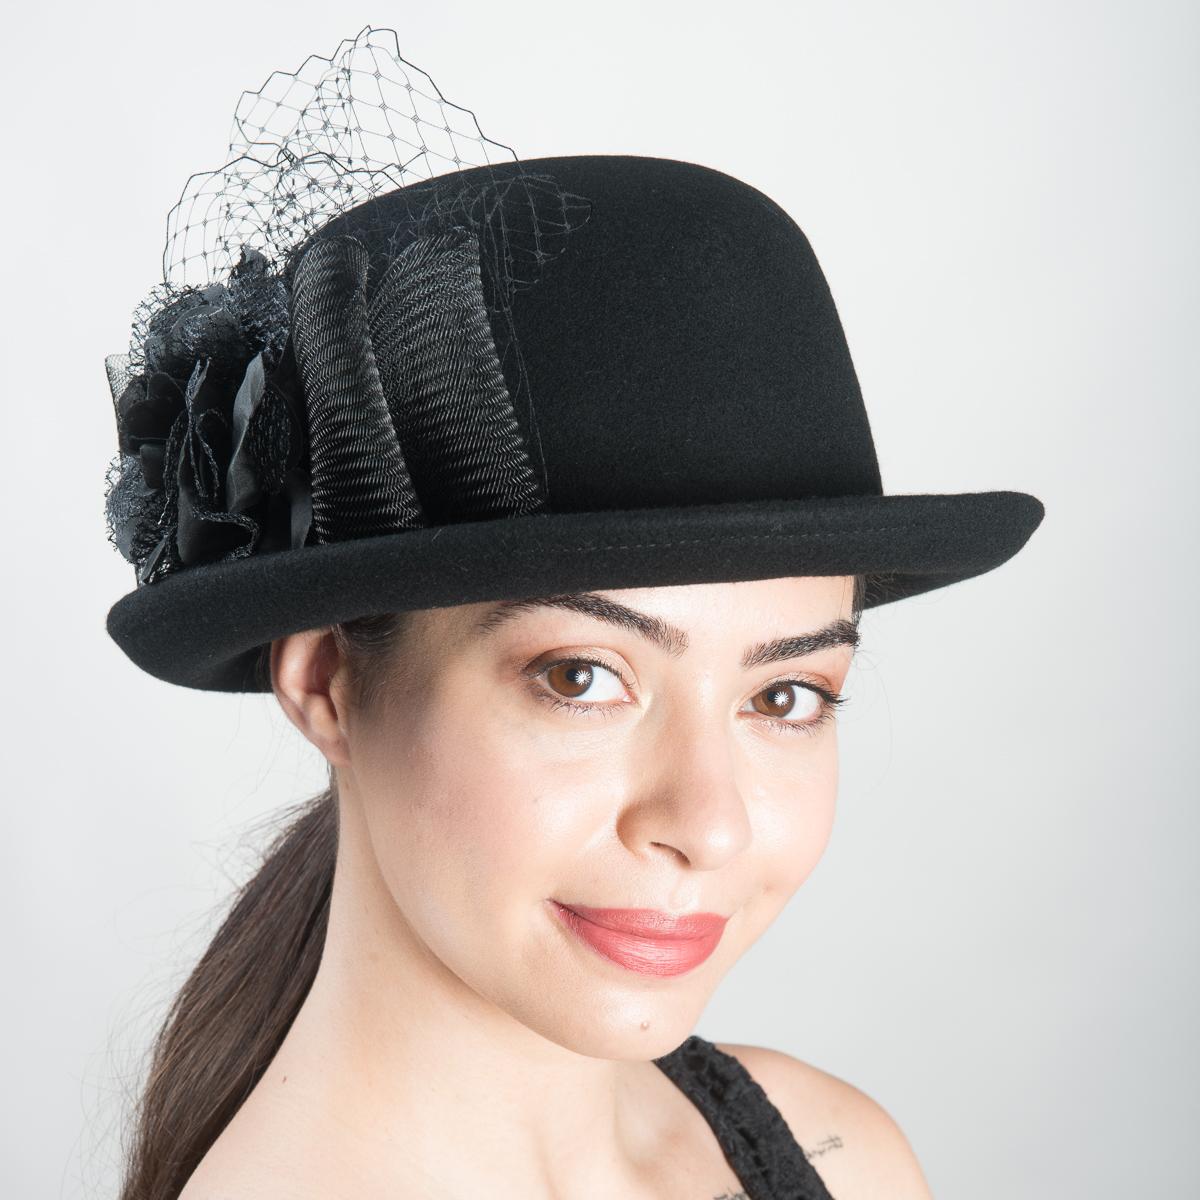 48b46593ef11a Black Small Derby-Flower-Veil Hats-400676V-BK- Sun Yorkos | KaKyCo  Accessories